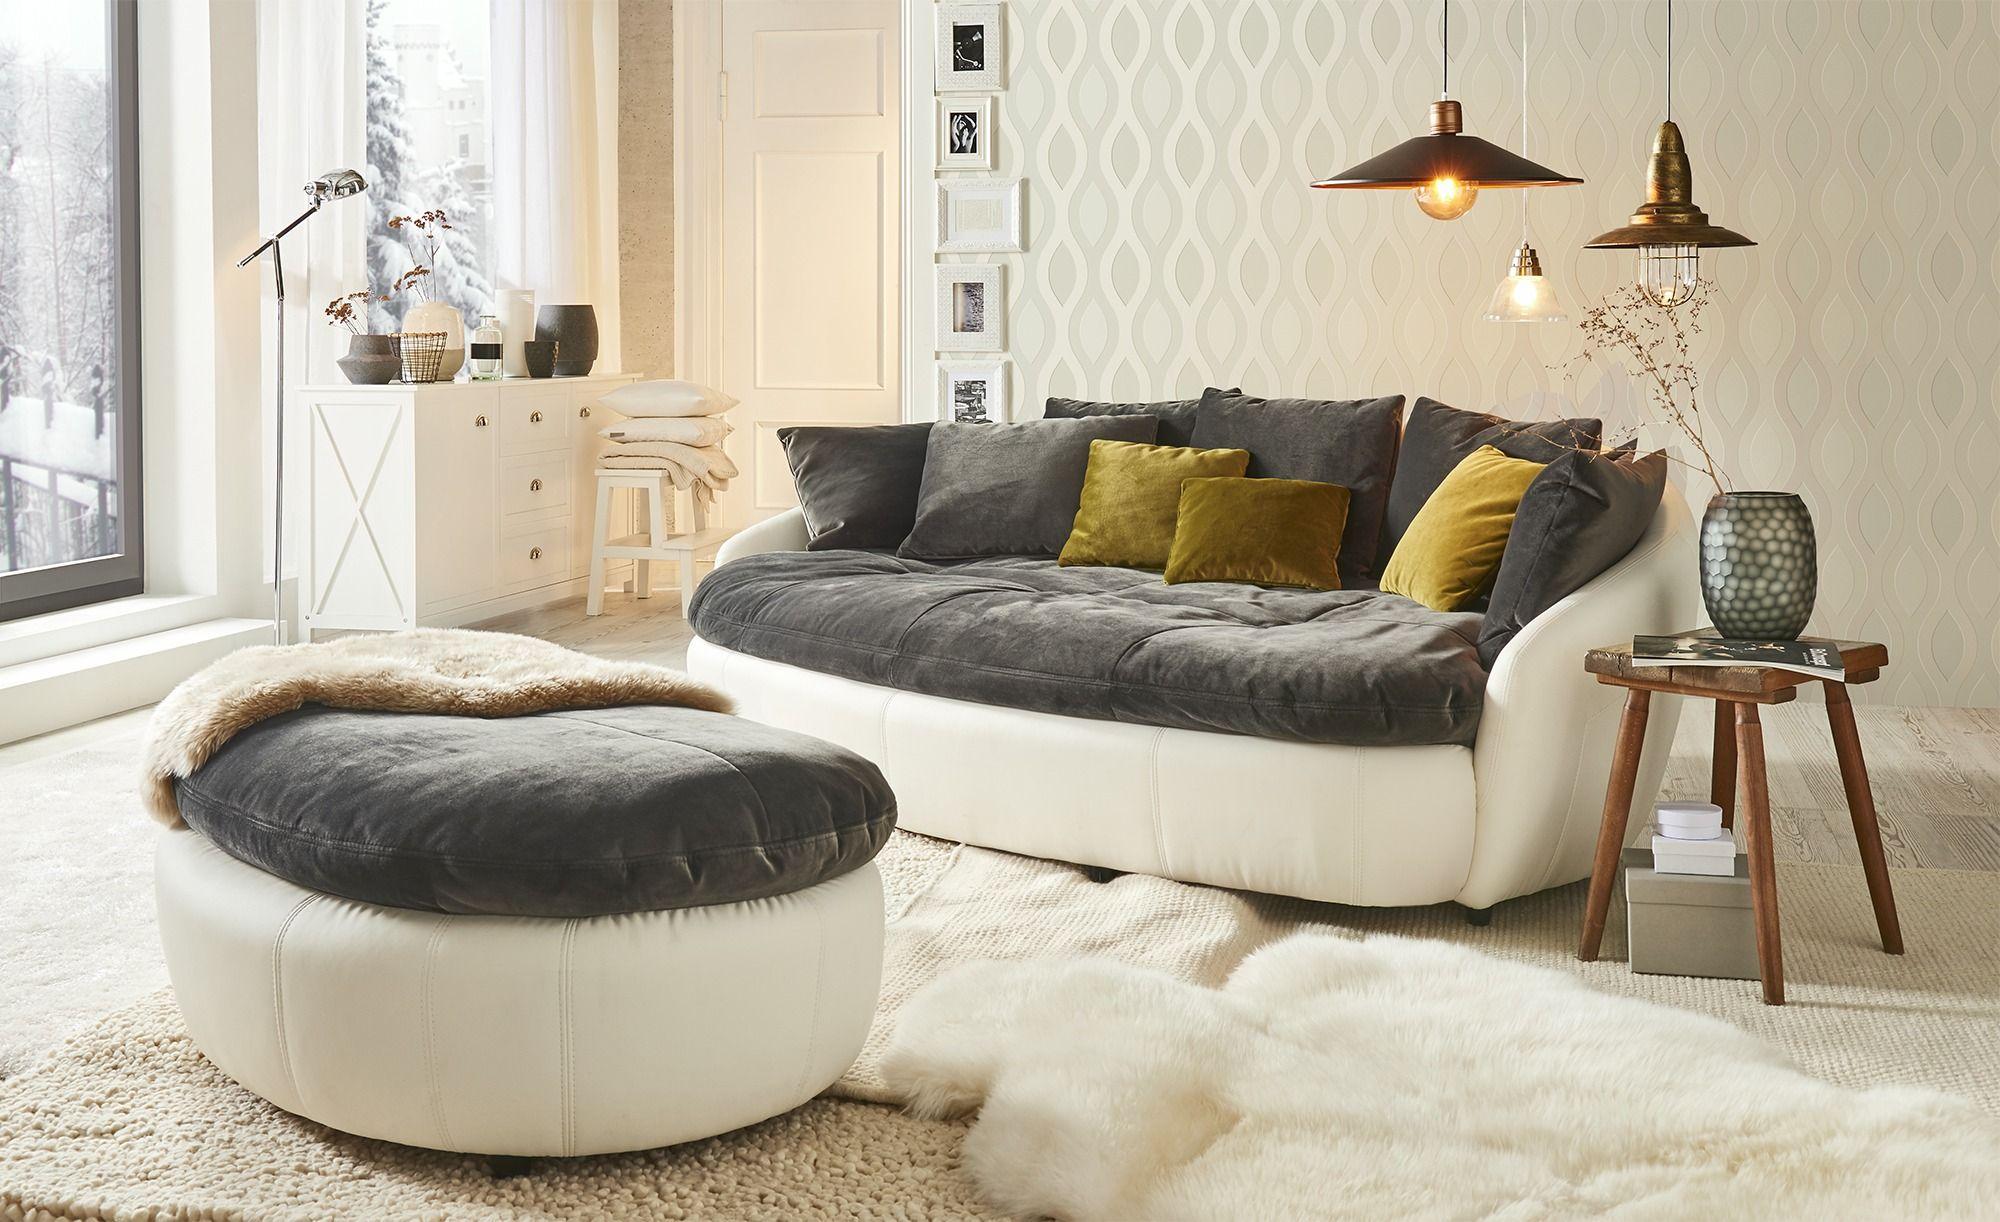 Full Size of Sofa Rund Arundel Chesterfield Bed Rundecke Klein Rundy Leder Design Oval Med Runde Former Dreamworks Couch Form Leather Big Elegant Mit Relaxfunktion 3 Sitzer Sofa Sofa Rund